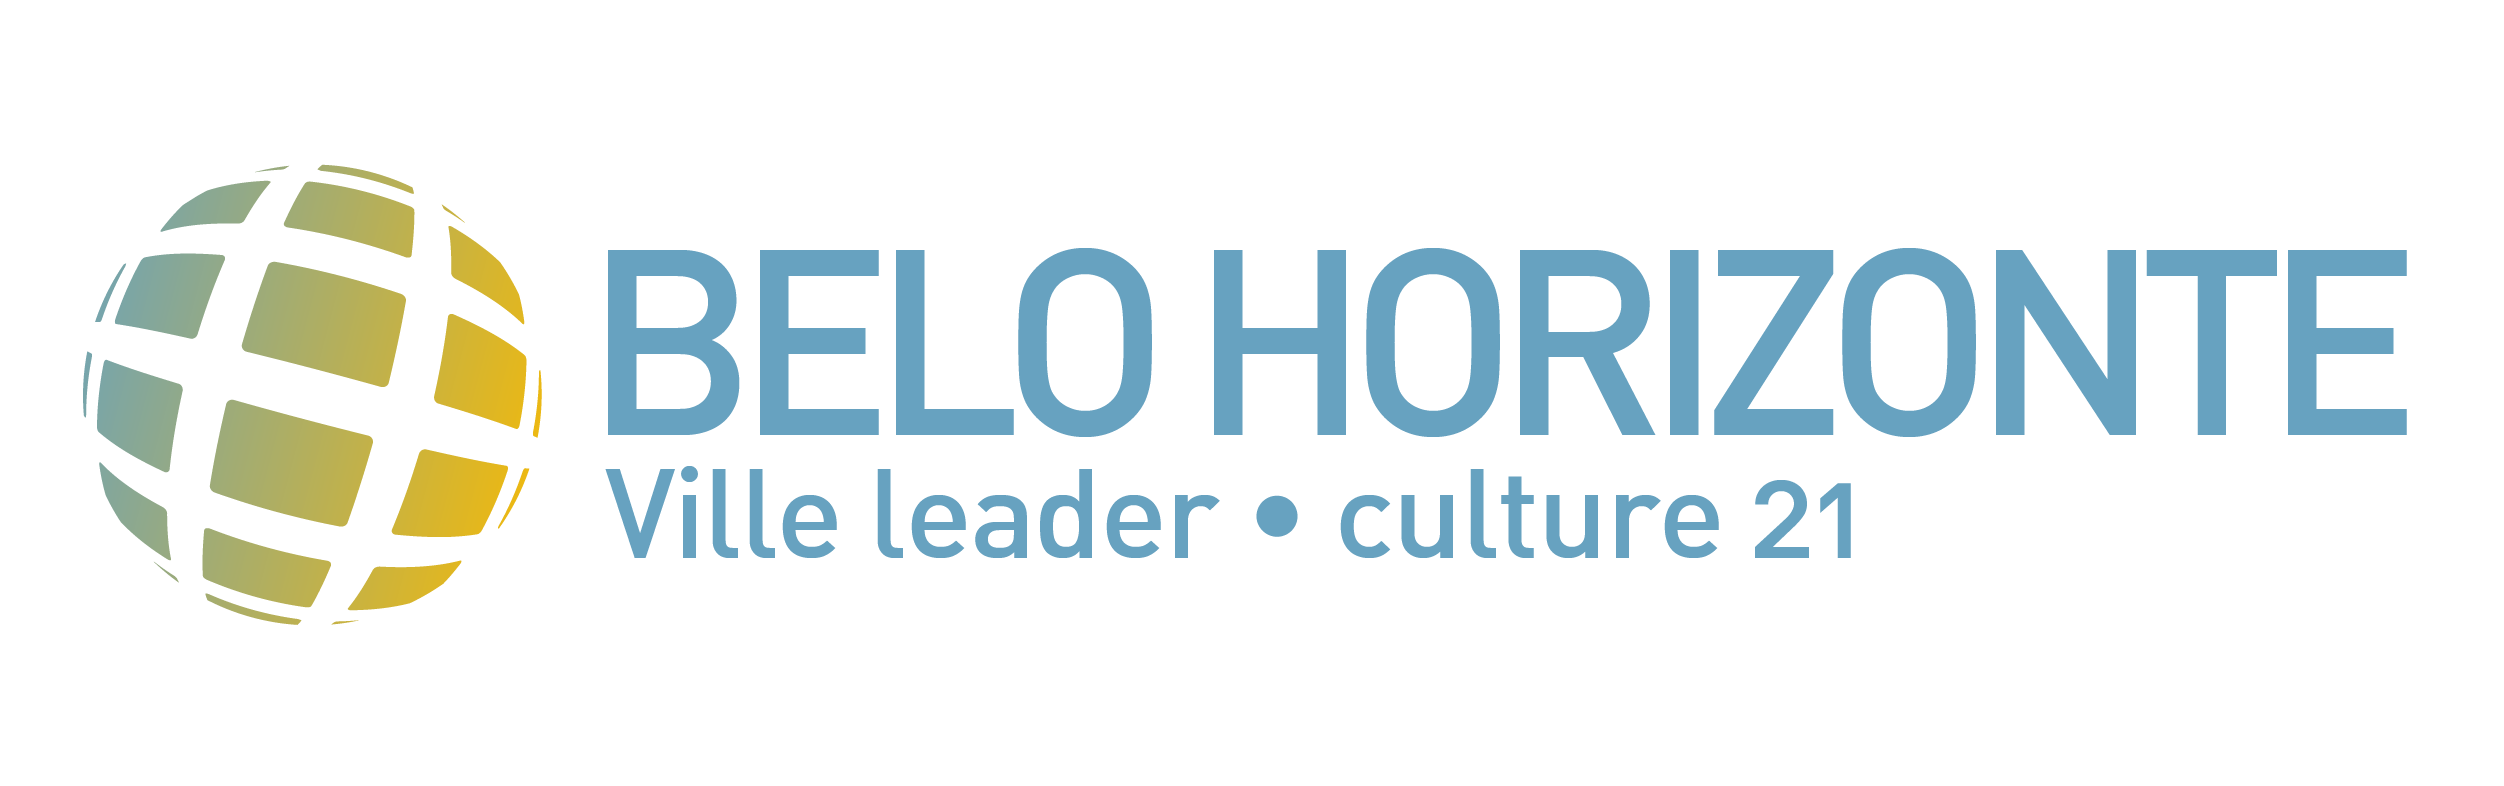 Logo Belo Horizonte